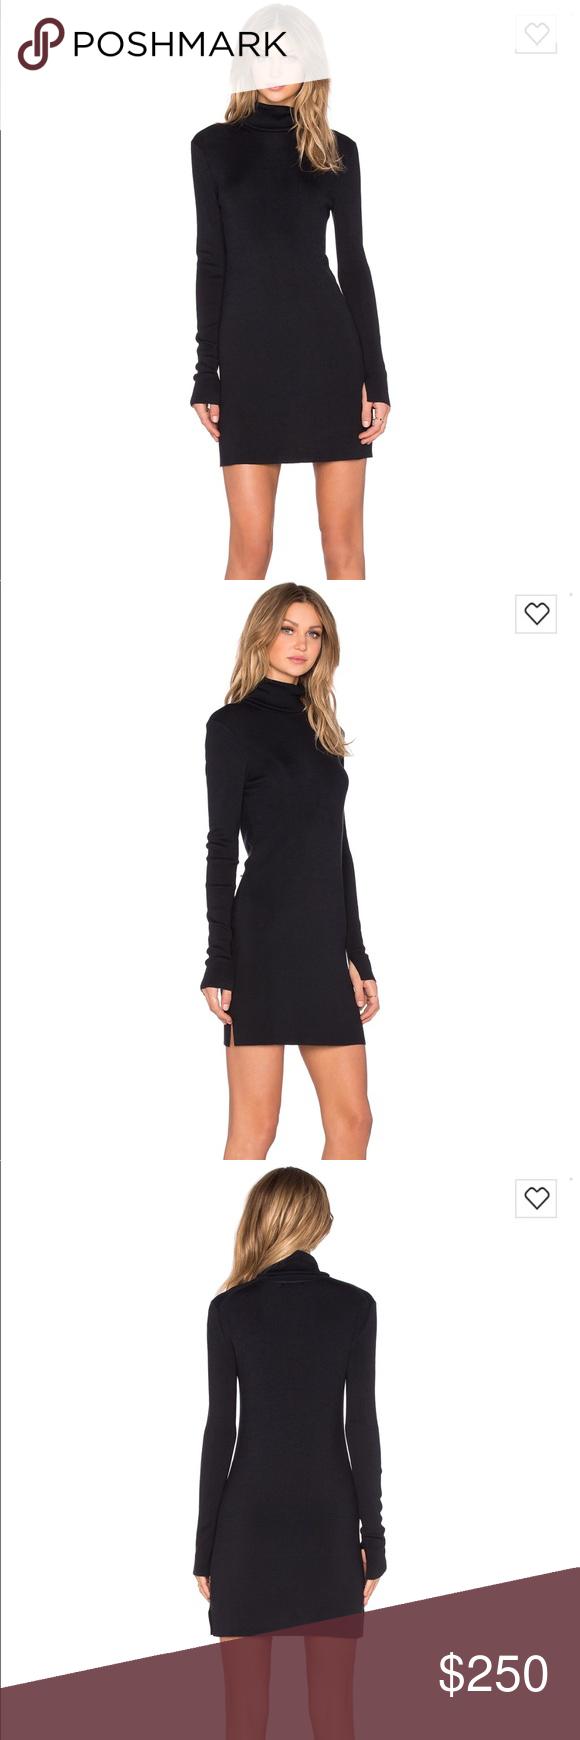 Nwt equipment silk elastane turtleneck dress turtleneck dress